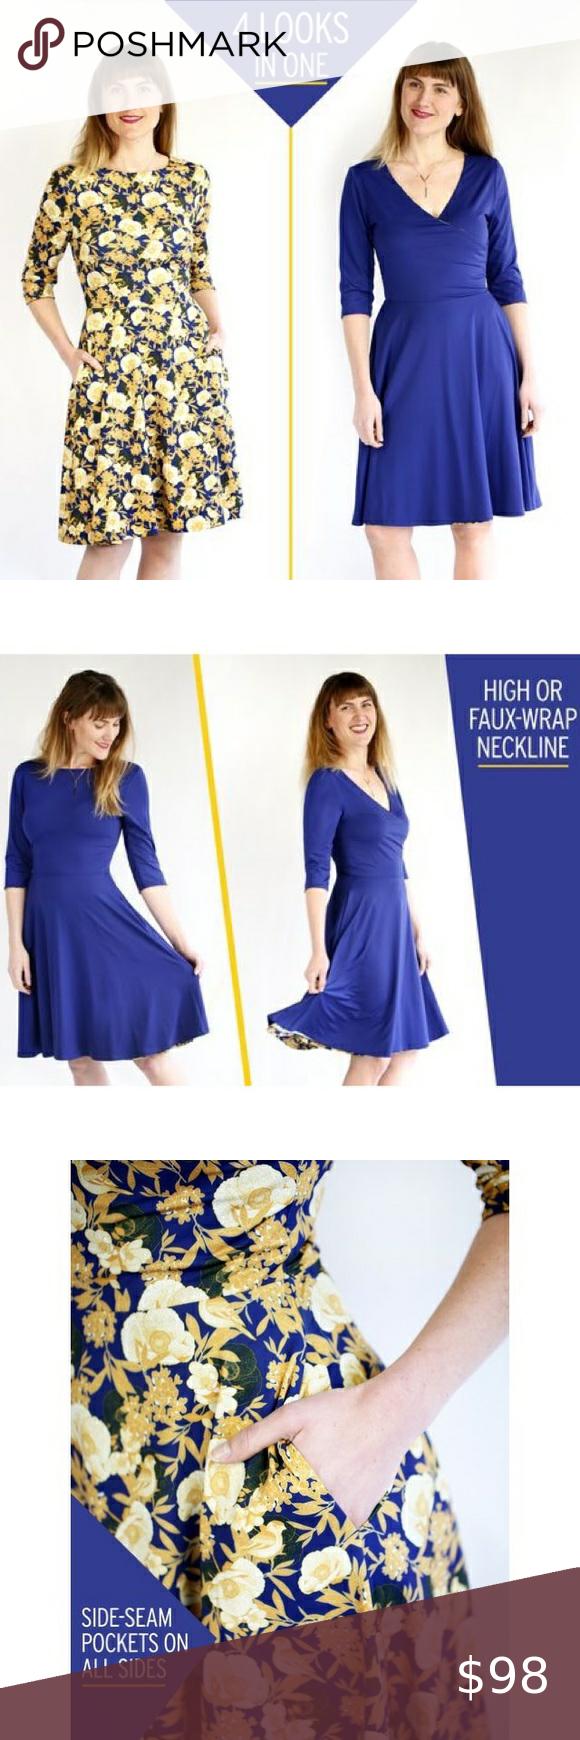 Betabrand Blue Yellow Round Trip Dress Size M Dresses Easy Wear Betabrand [ 1740 x 580 Pixel ]